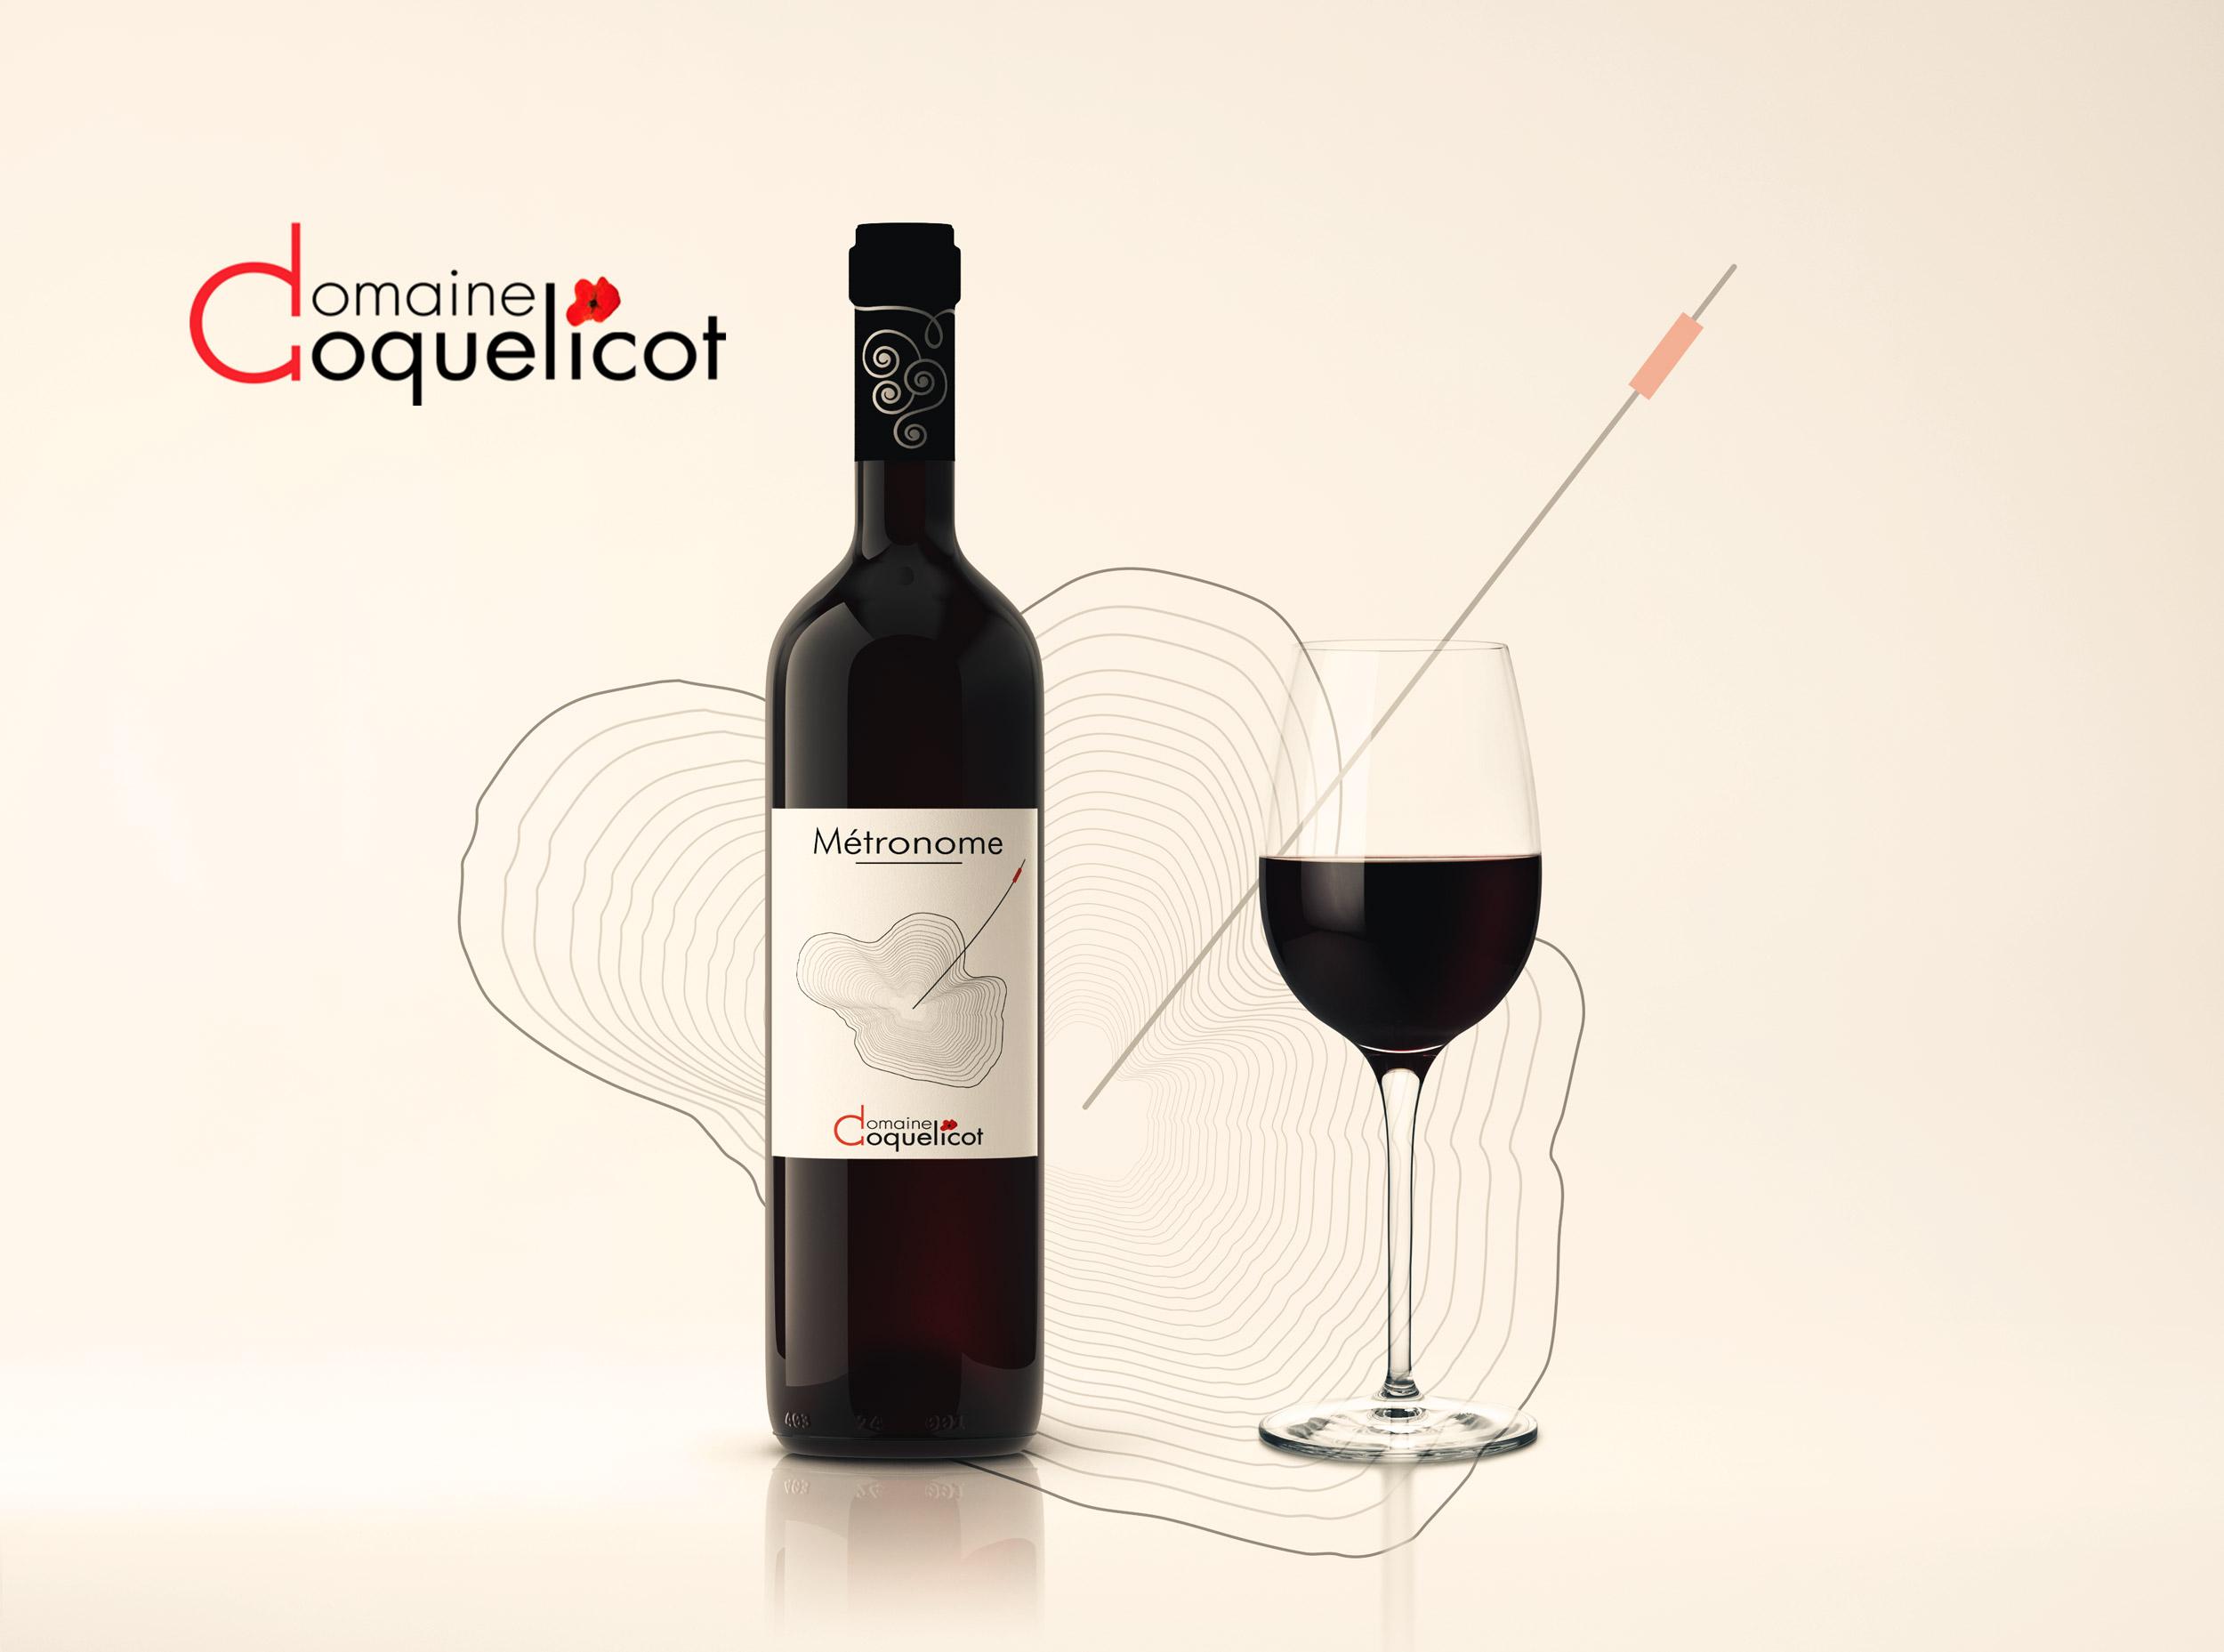 2017 - Domaine coquelicot